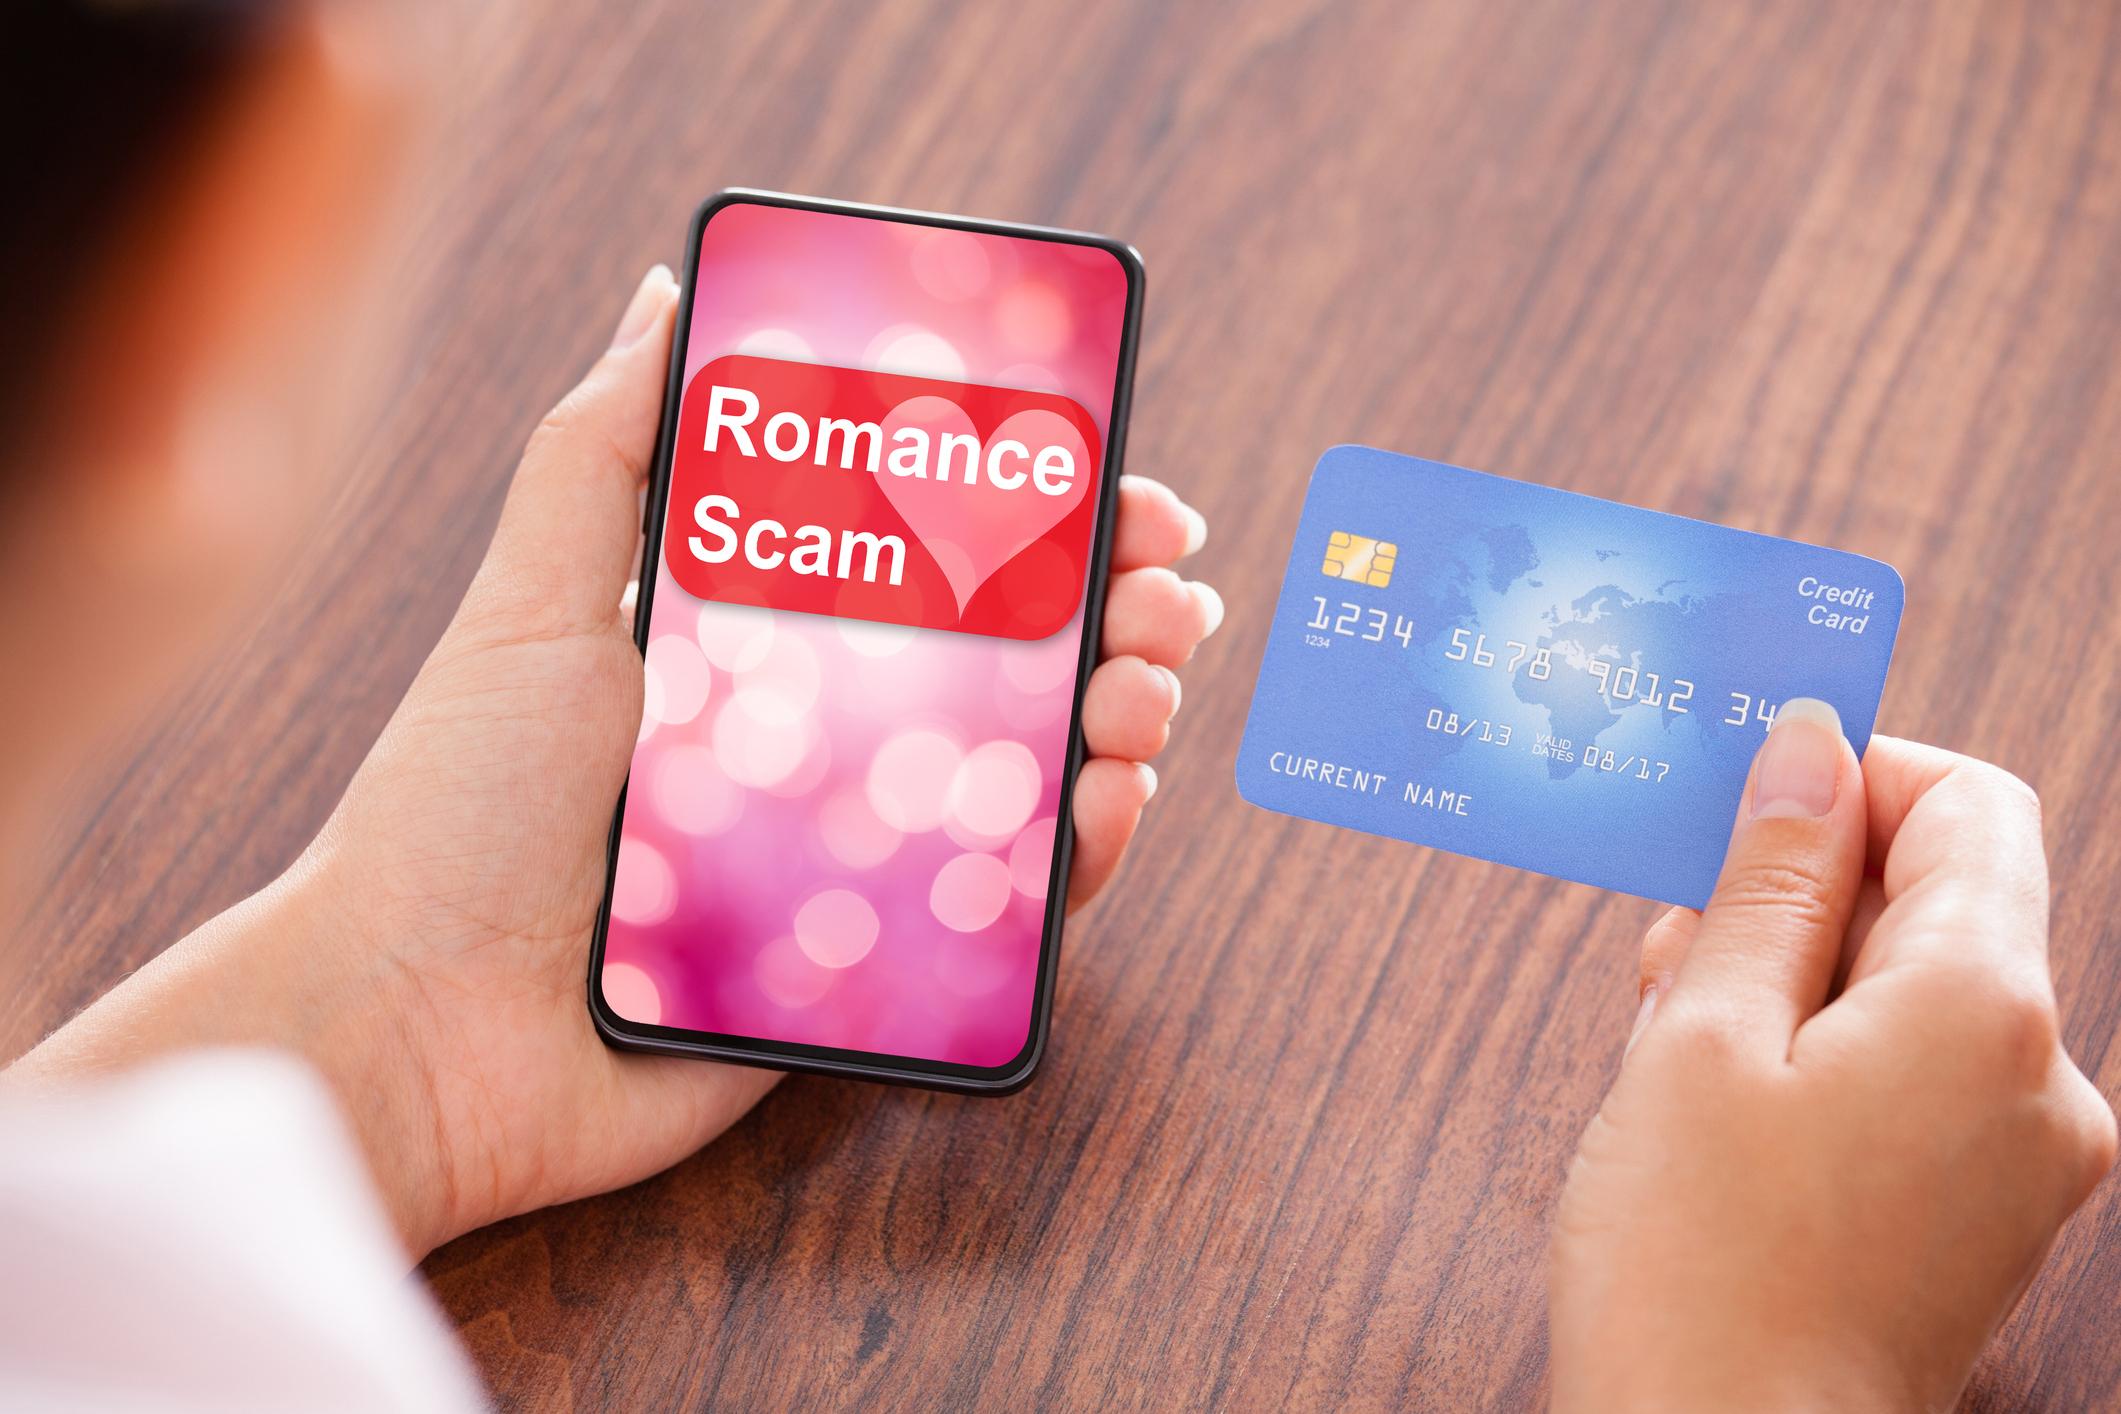 Fbi internet dating scams free mobile dating apps for blackberry